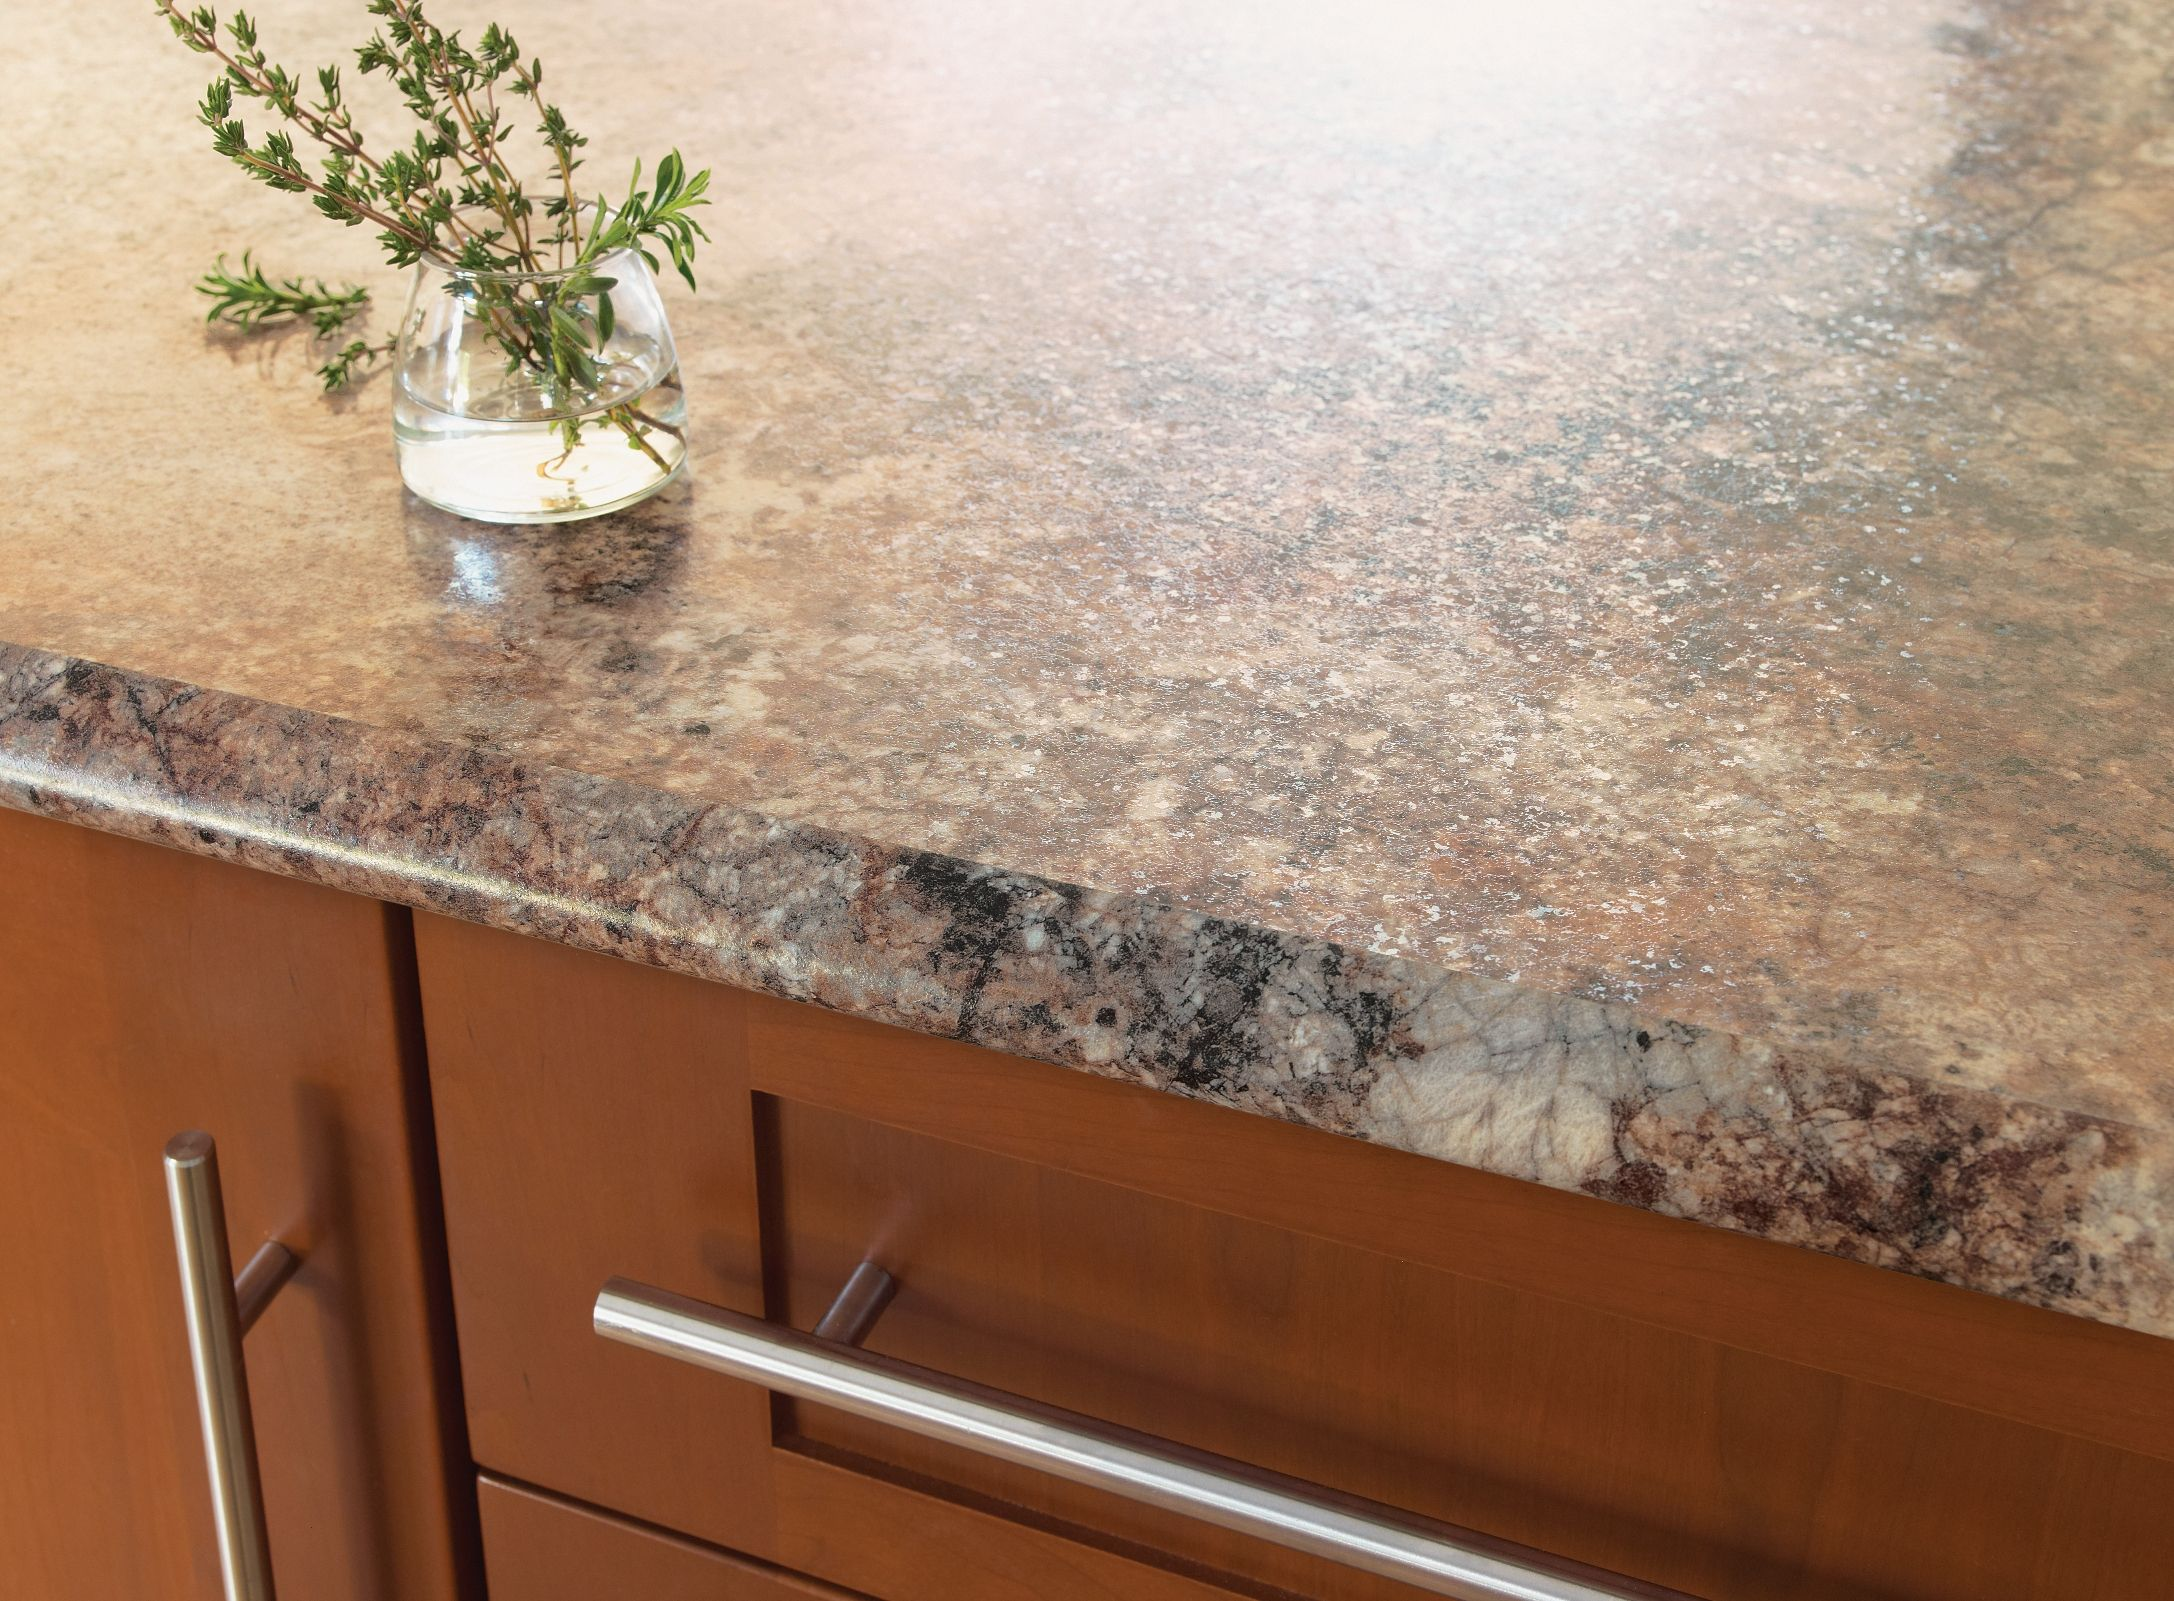 Formica Antique Mascarello Kitchen Countertop Laminate